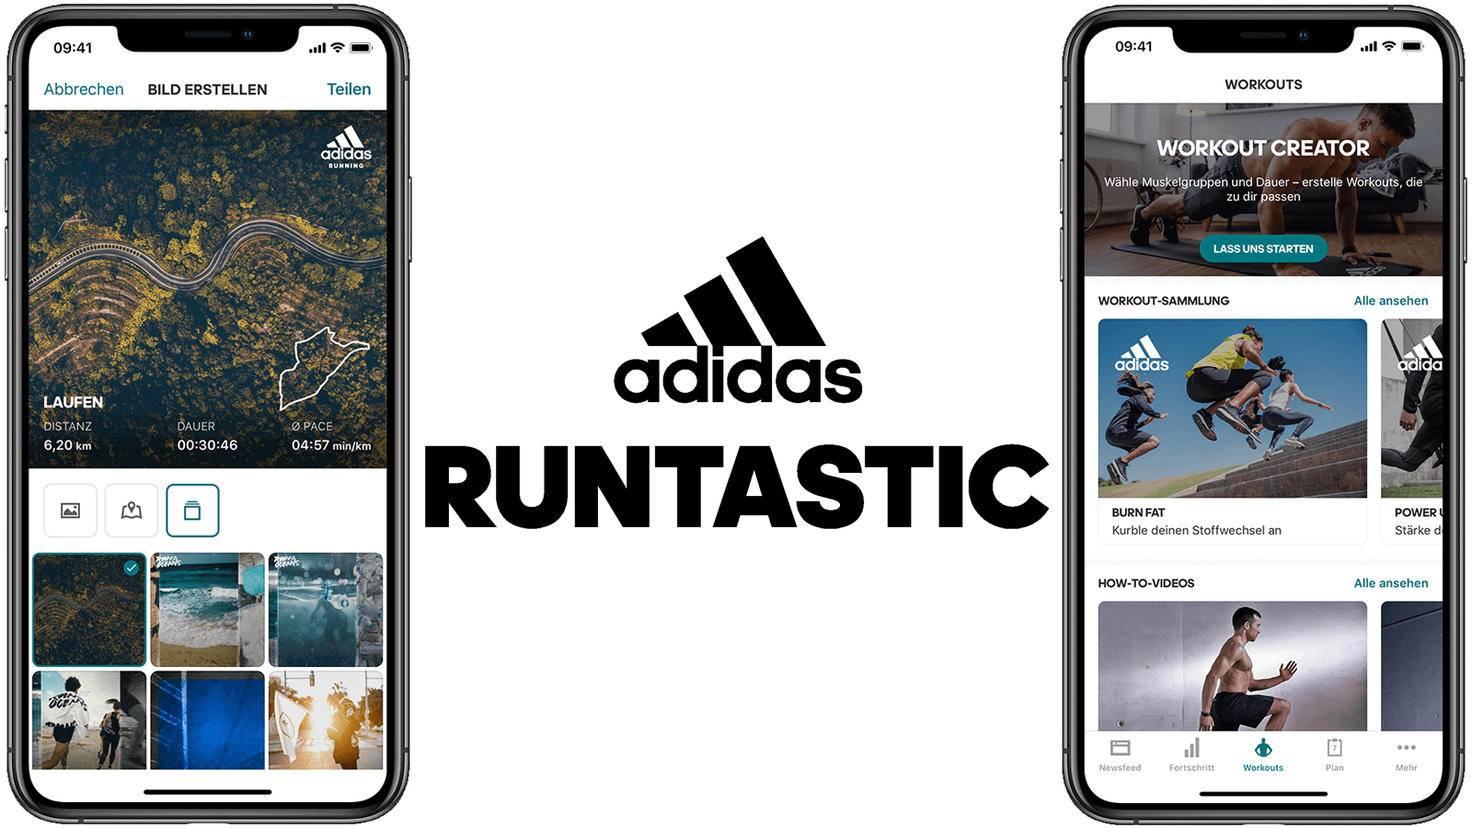 Adidas Running Runtastic-Adidas Training Runtastic-Adidas Runtastic